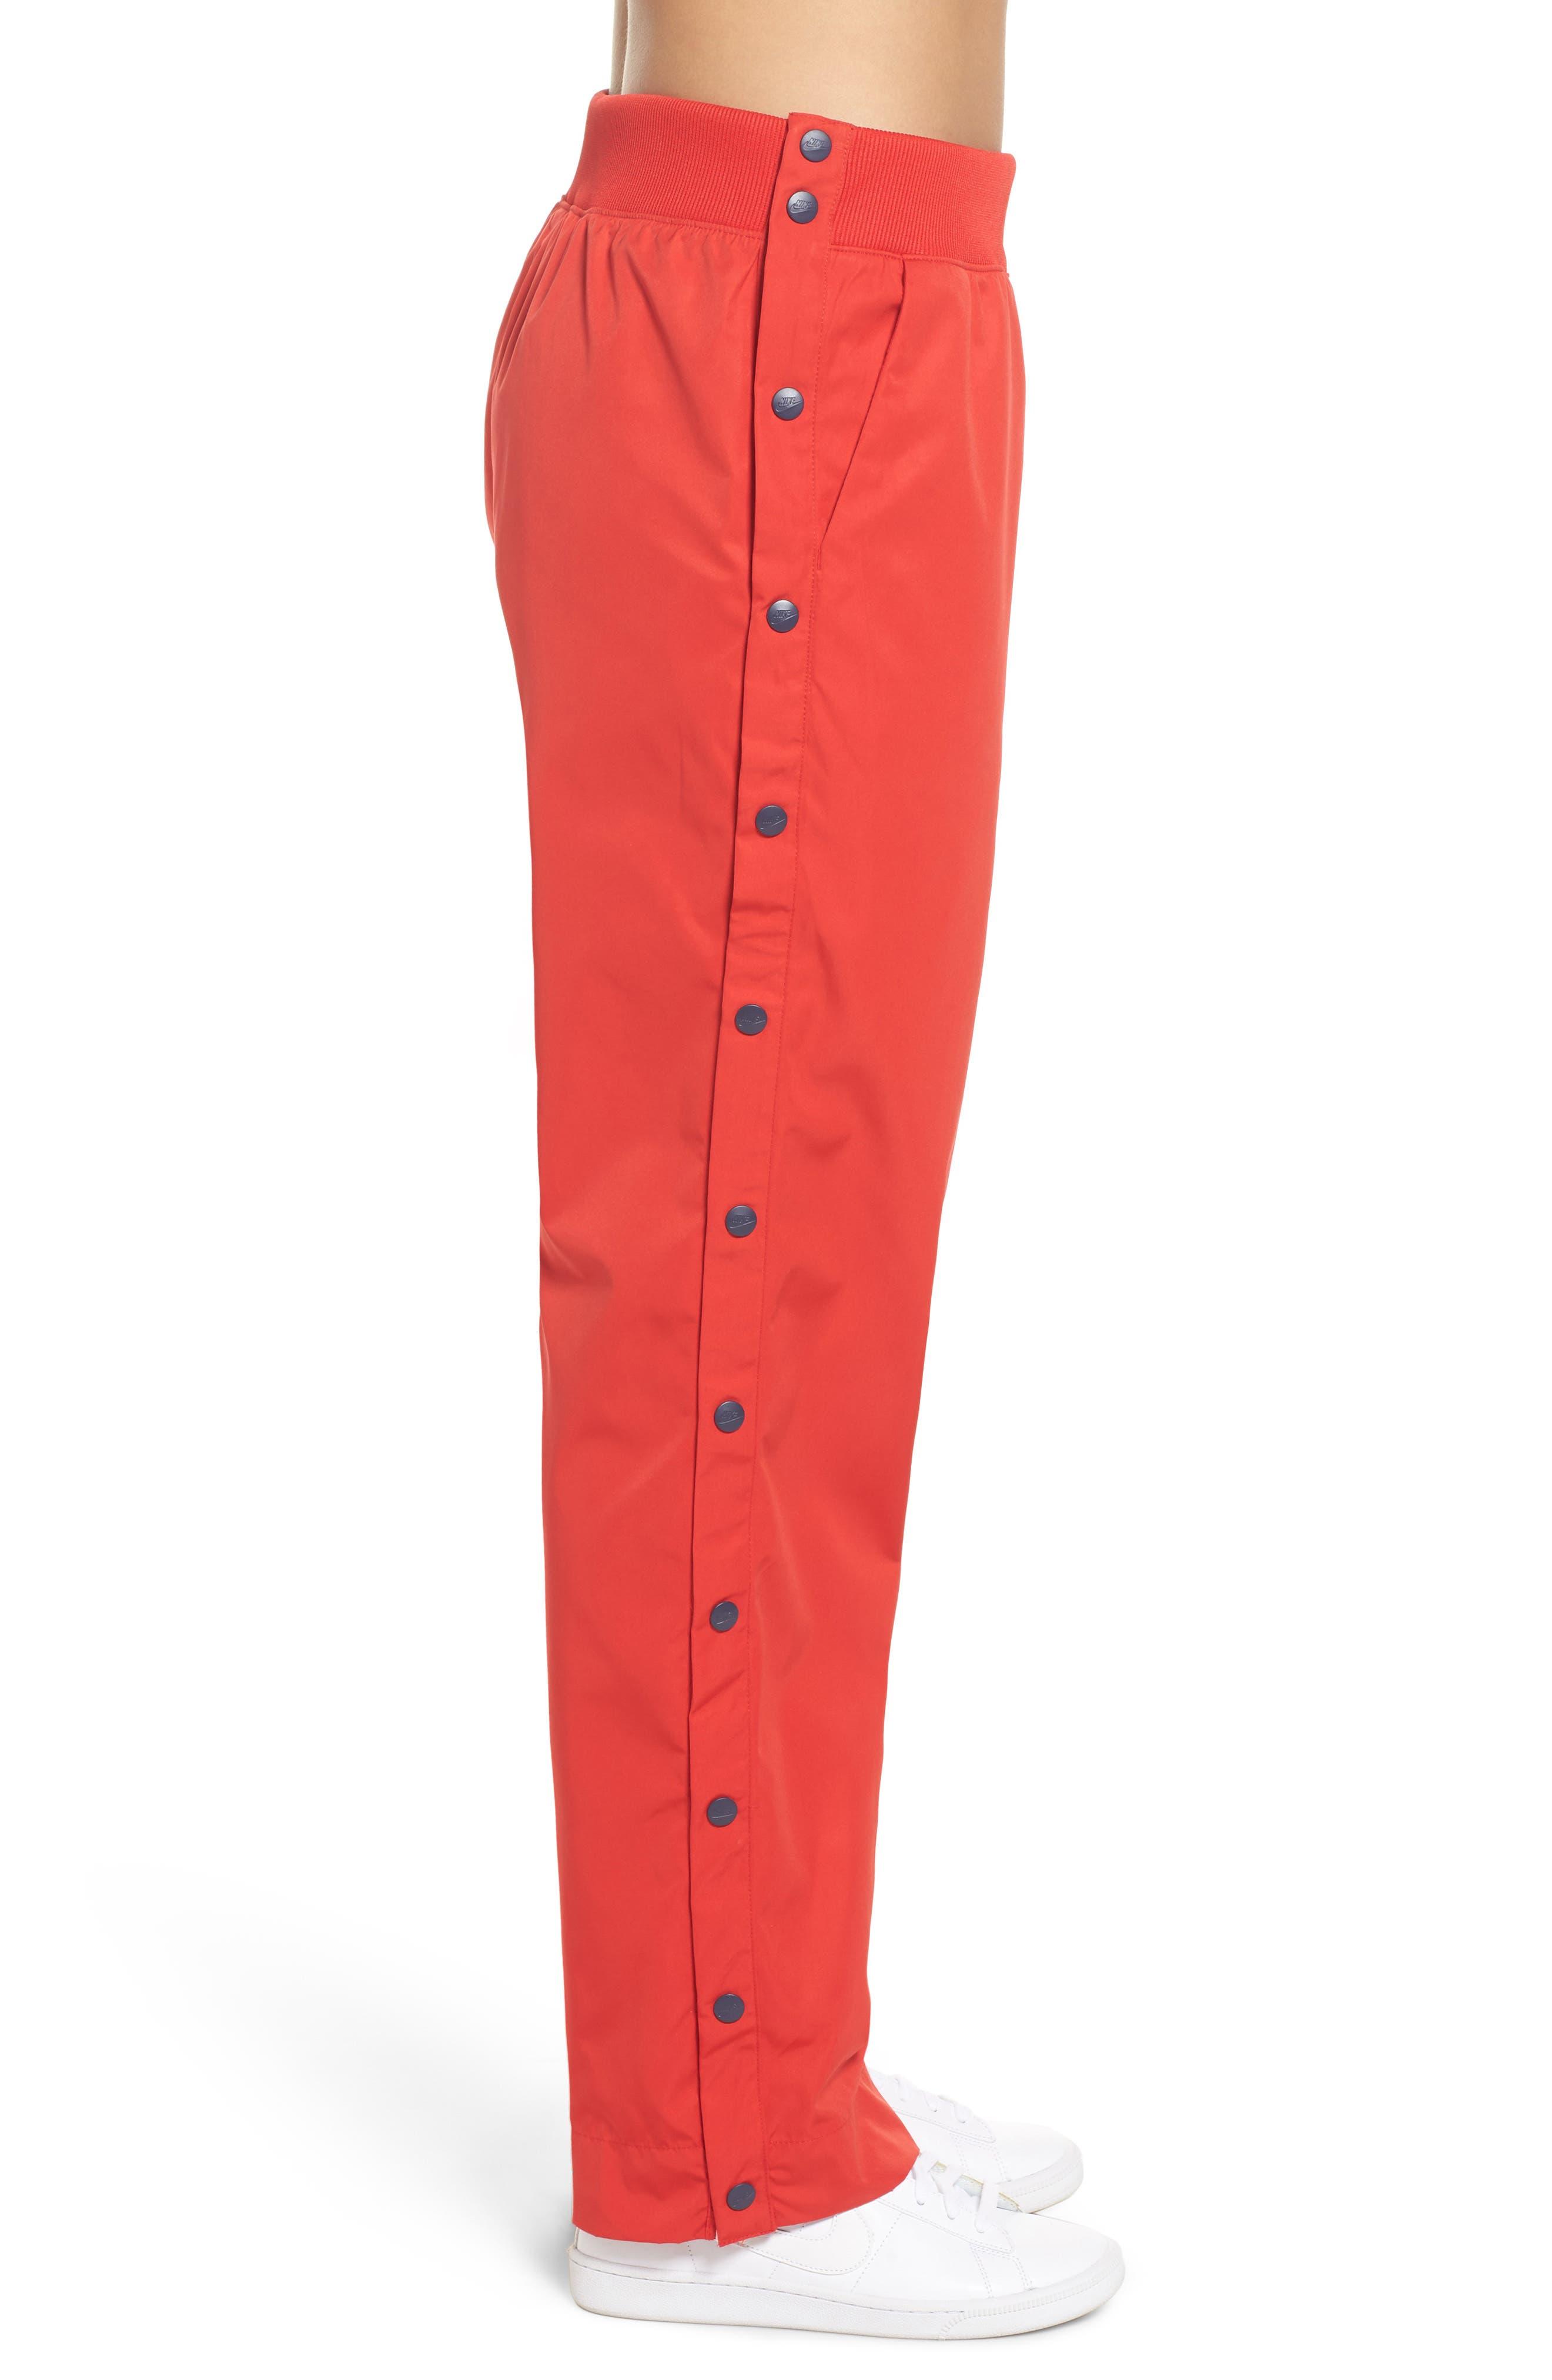 Sportswear Archive Snap Track Pants,                             Alternate thumbnail 3, color,                             University Red/ Thunder Blue